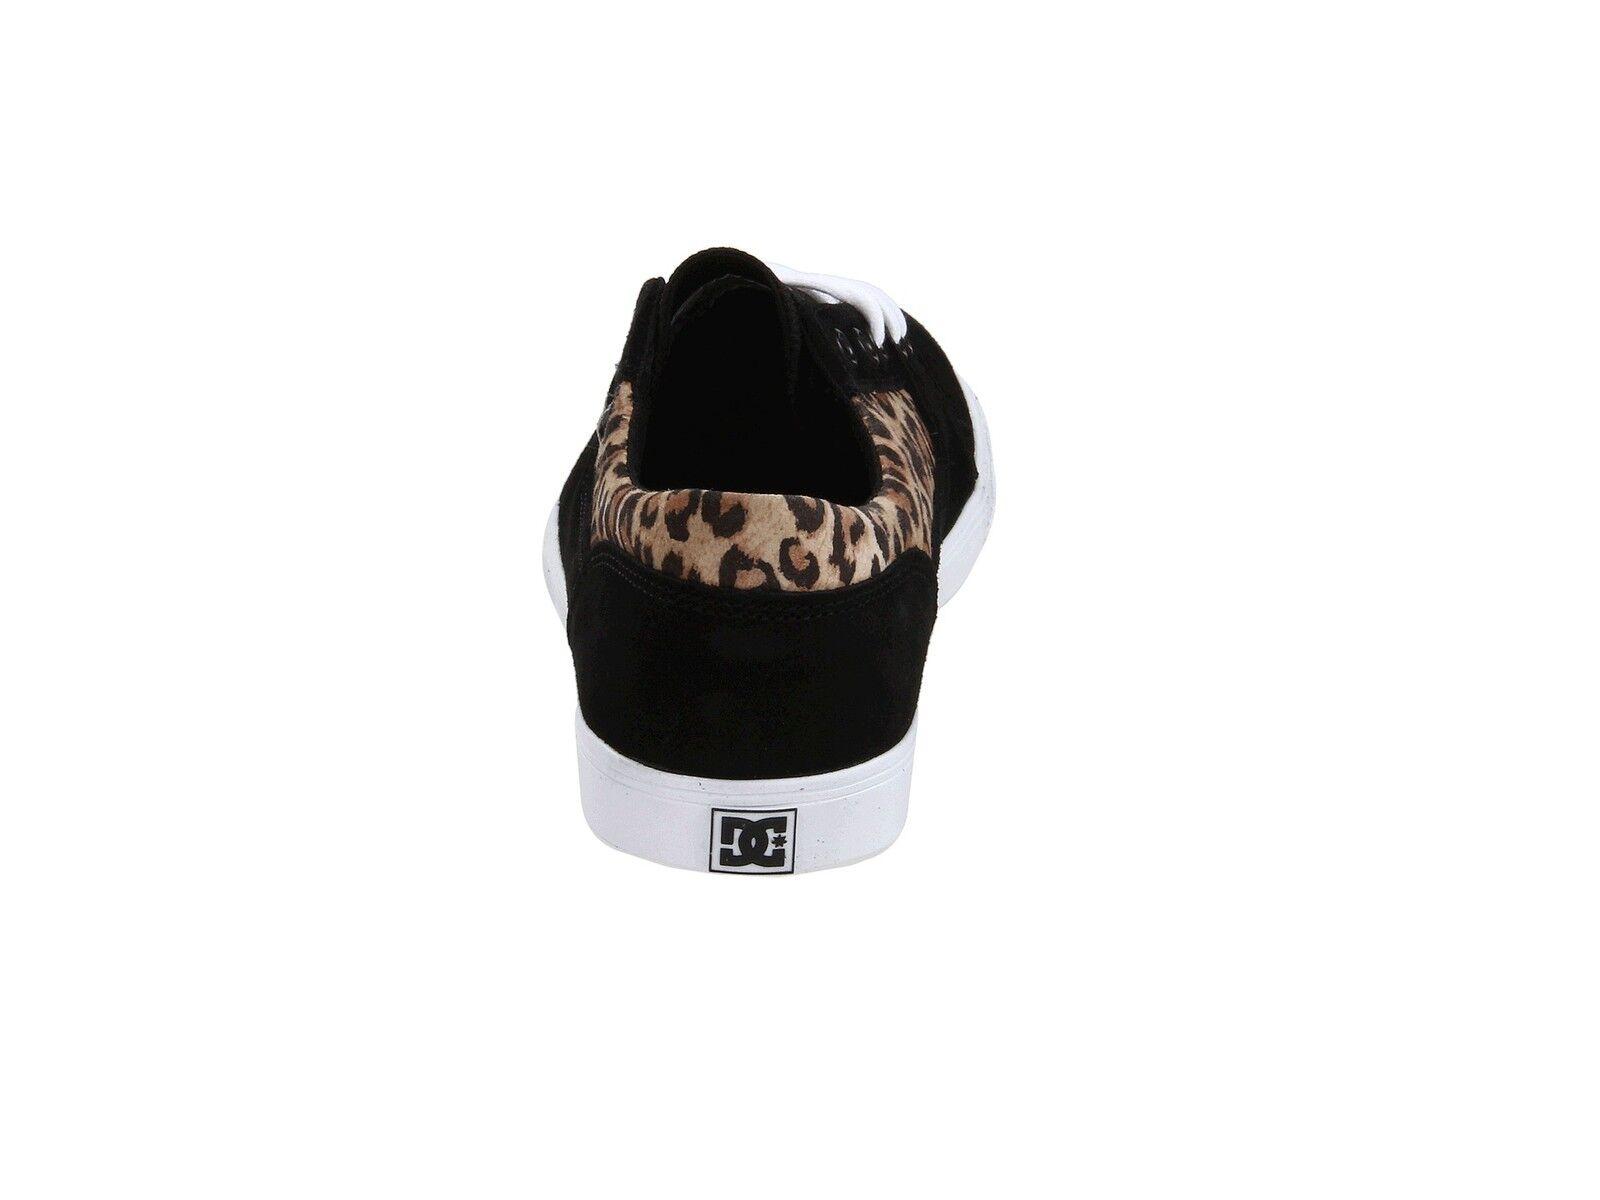 DC Schuhes - BRISTOL LE Damenschuhe Schuhes DC NEW Größe 9-11 LEOPARD BLACK Animal Print FREE SHIP 8d56cd